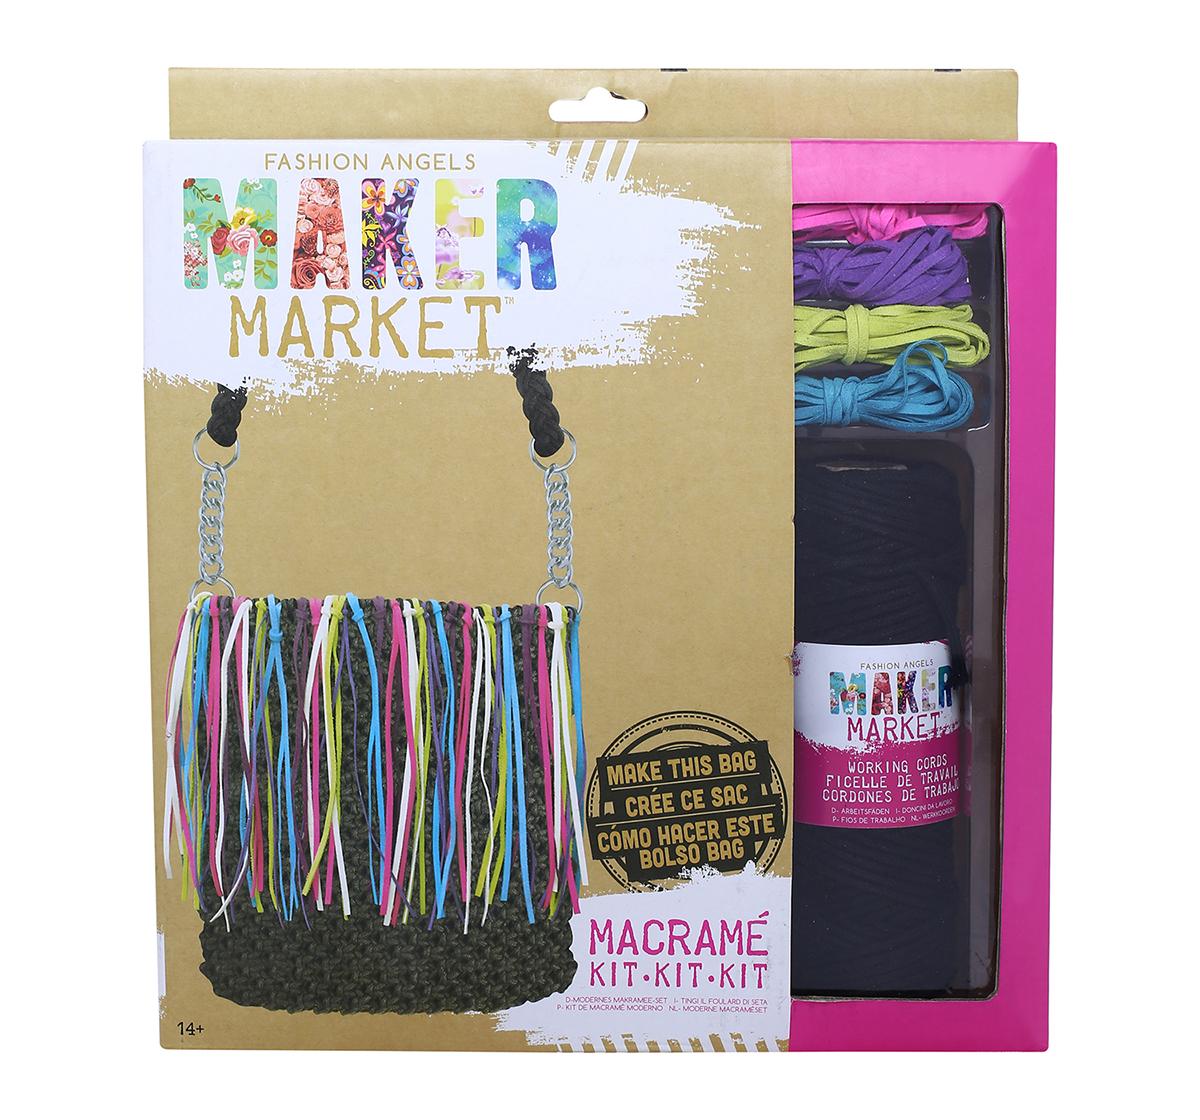 Fashion Angels   Fashion Angels Enterprises Maker Market Macrame Kit DIY Art & Craft Kits for Kids age 14Y+